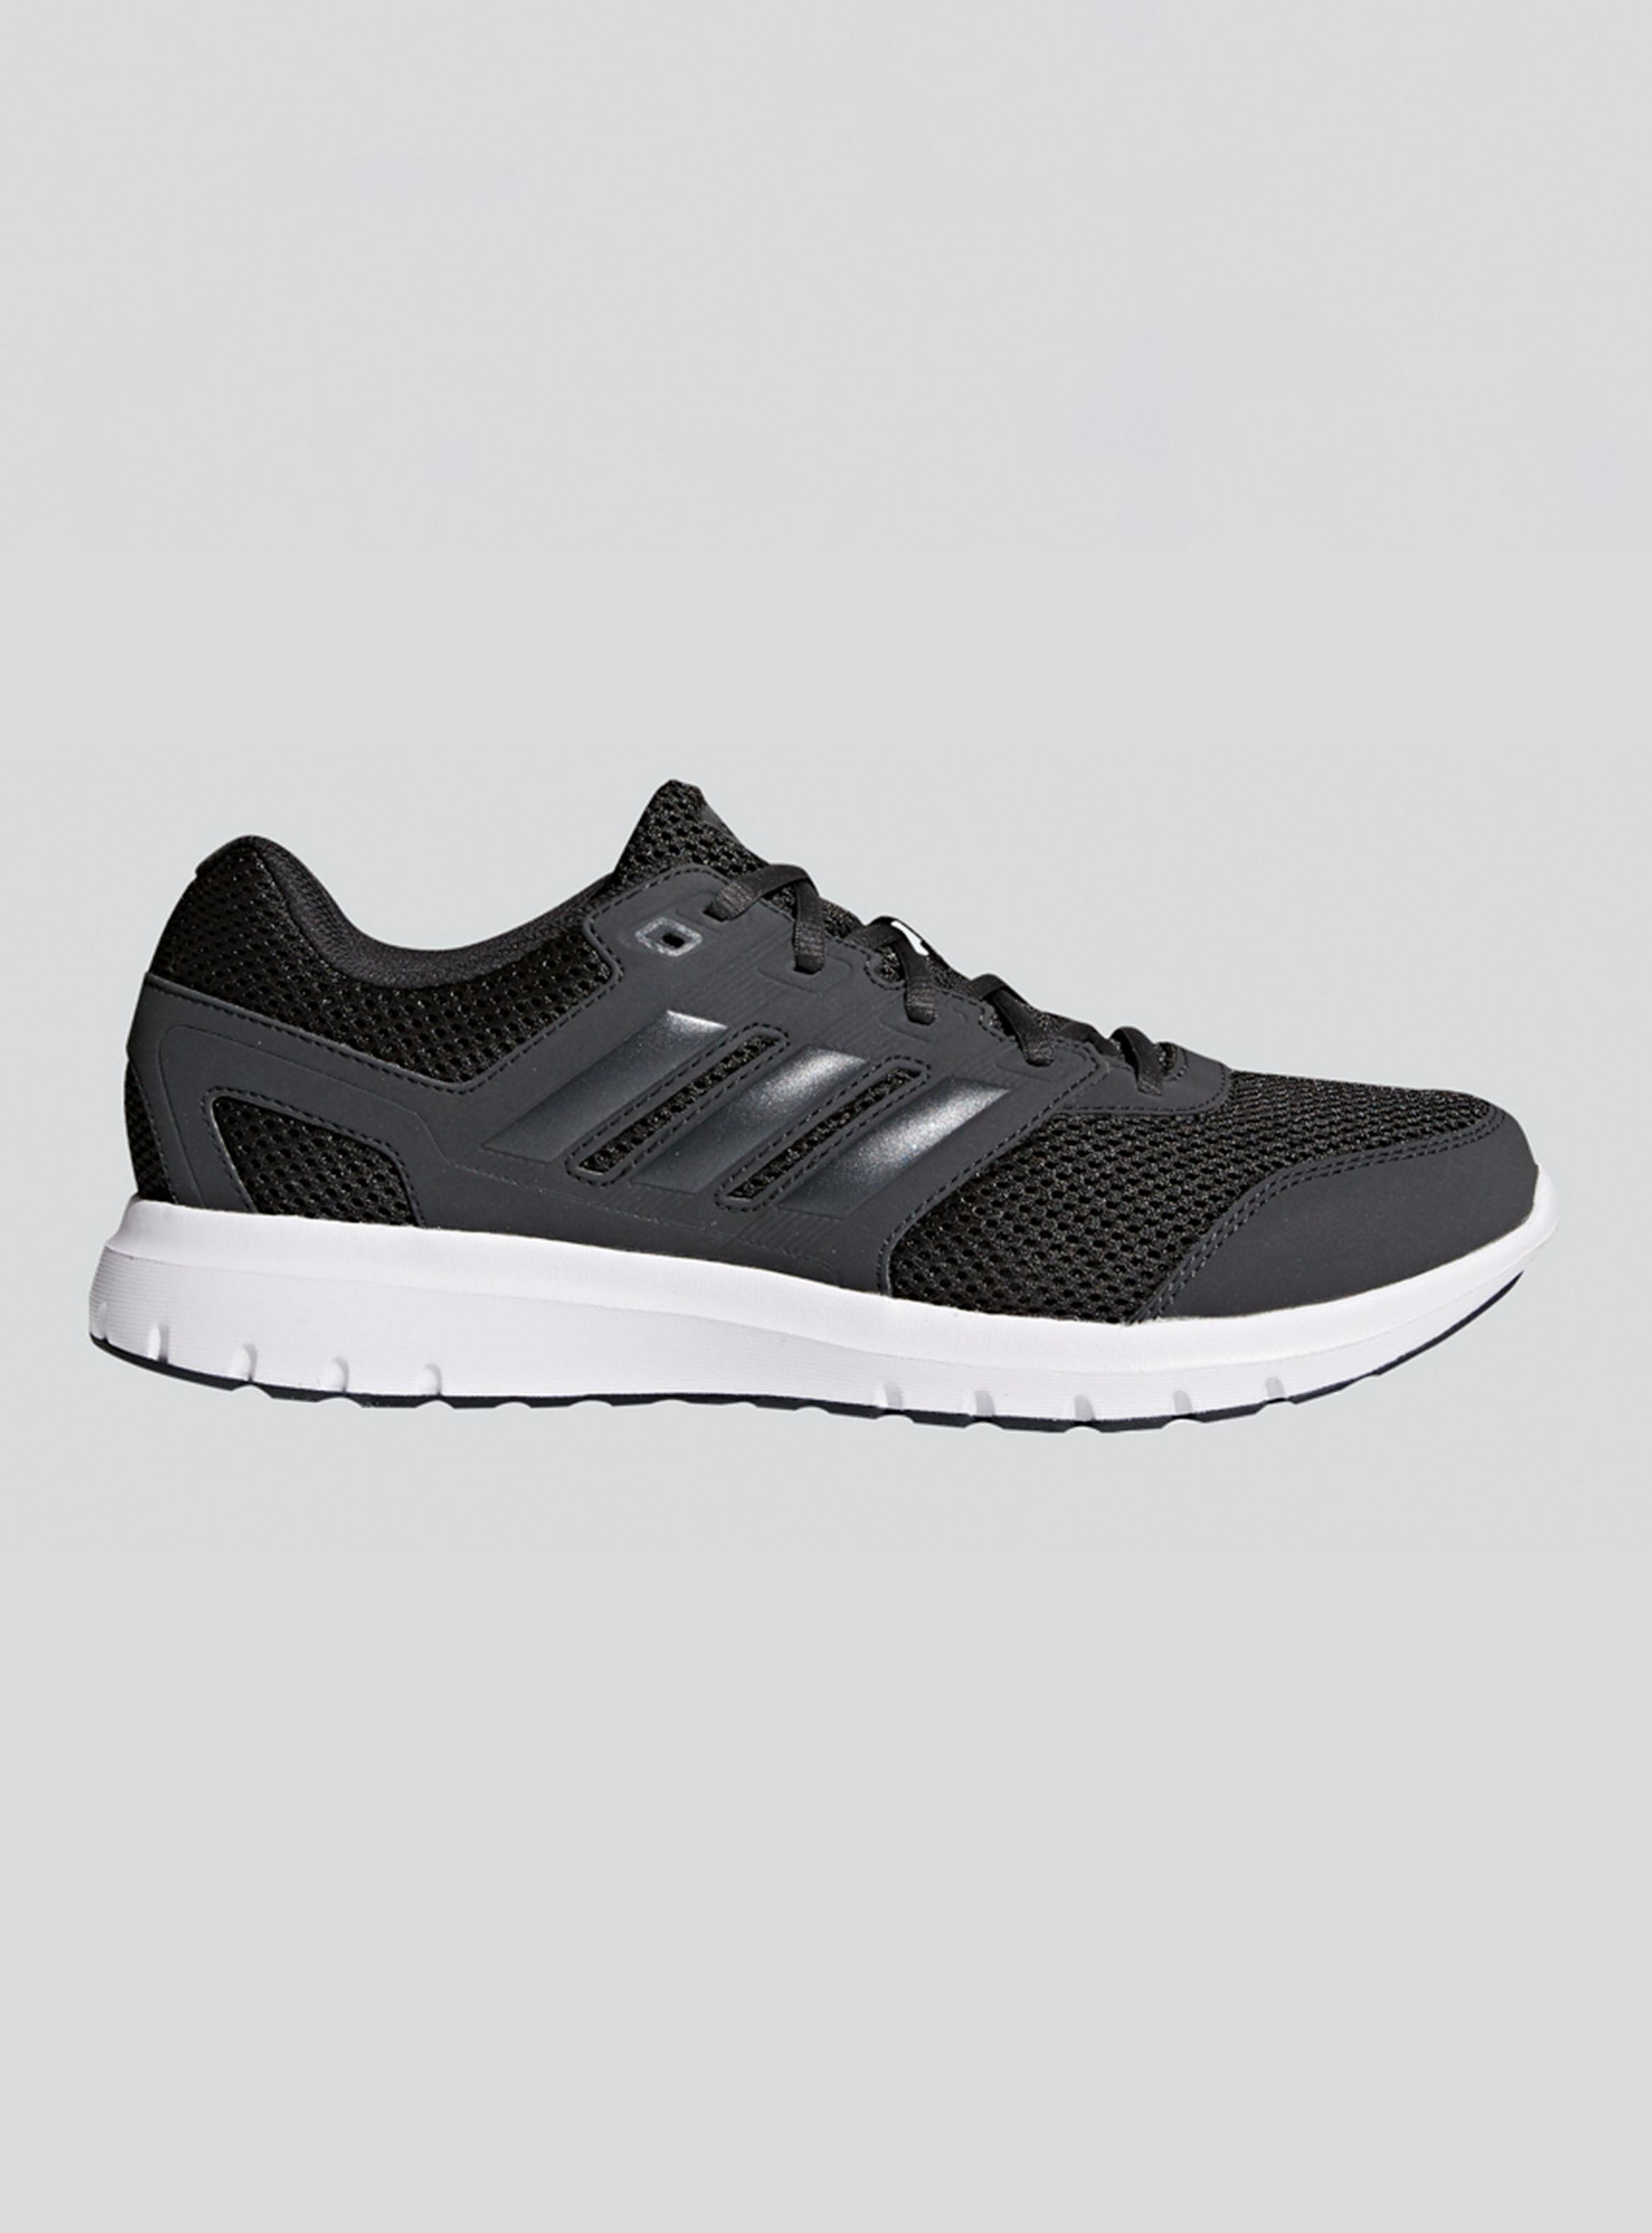 2 Duramo 0 Hombre Adidas Running Lite Paris Zapatilla Zapatillas xSqtgq f8265eaf57597